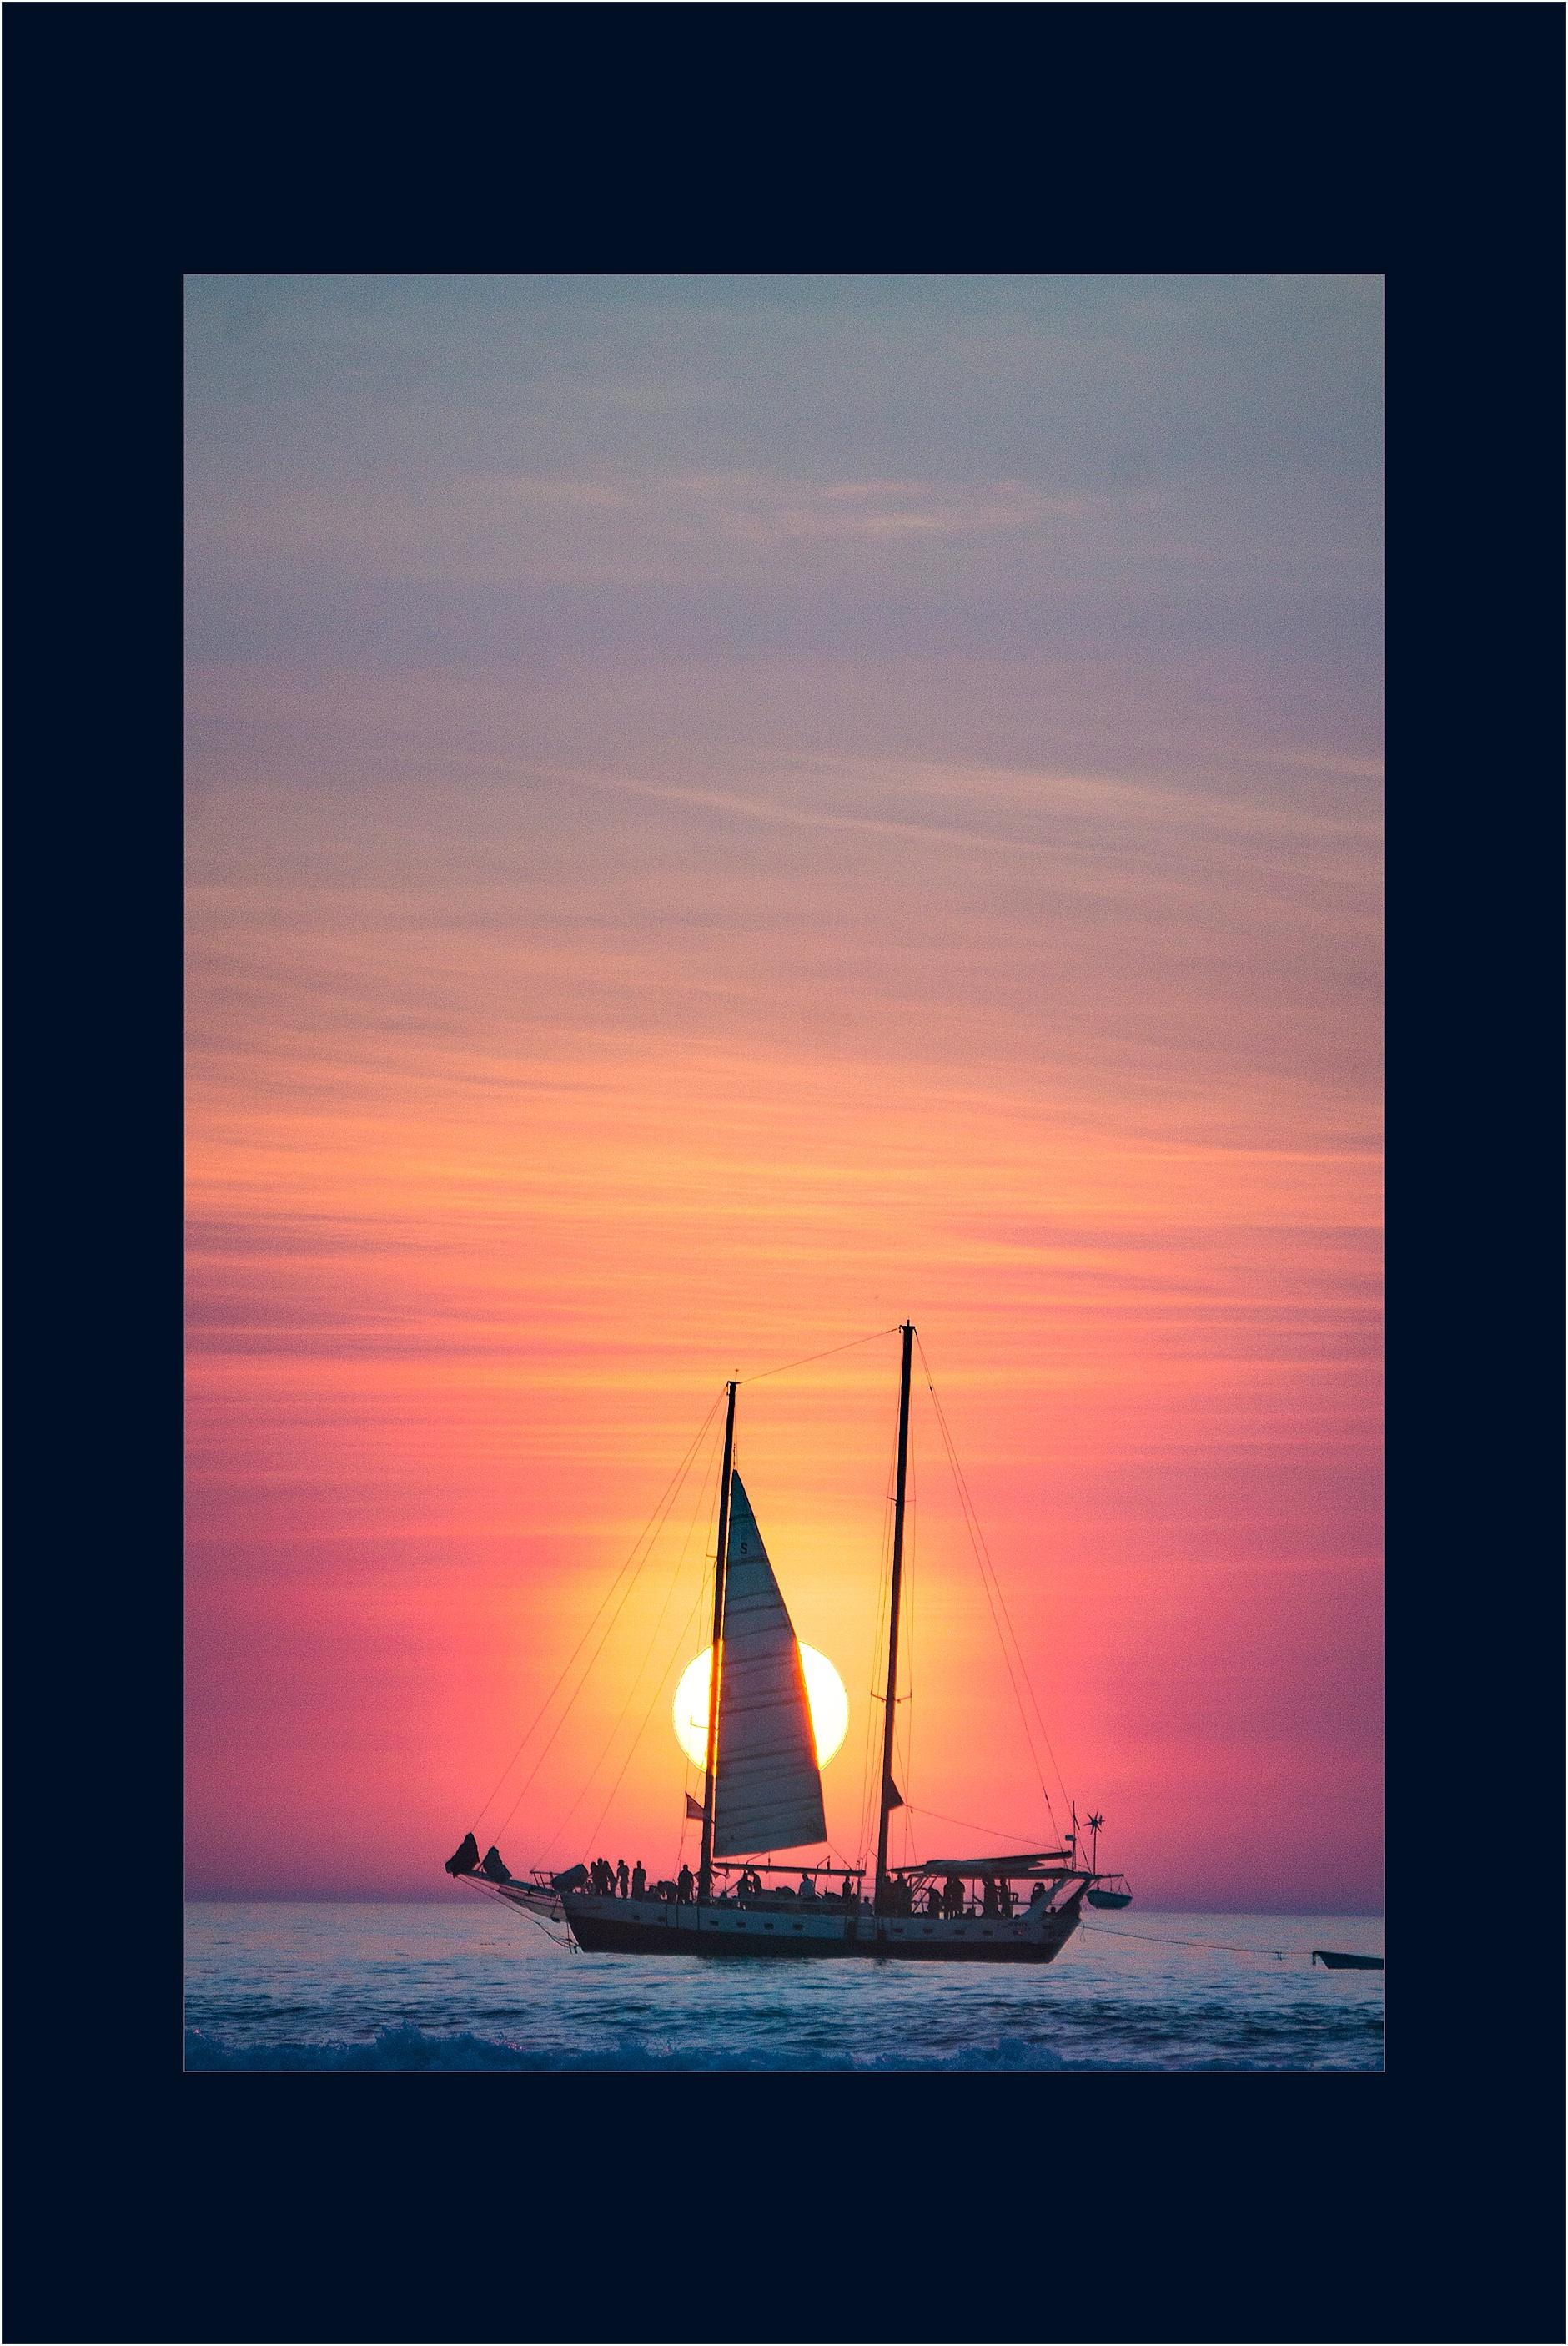 Award Winning Photographers, Destination Wedding Photographers - Sailor's Delight